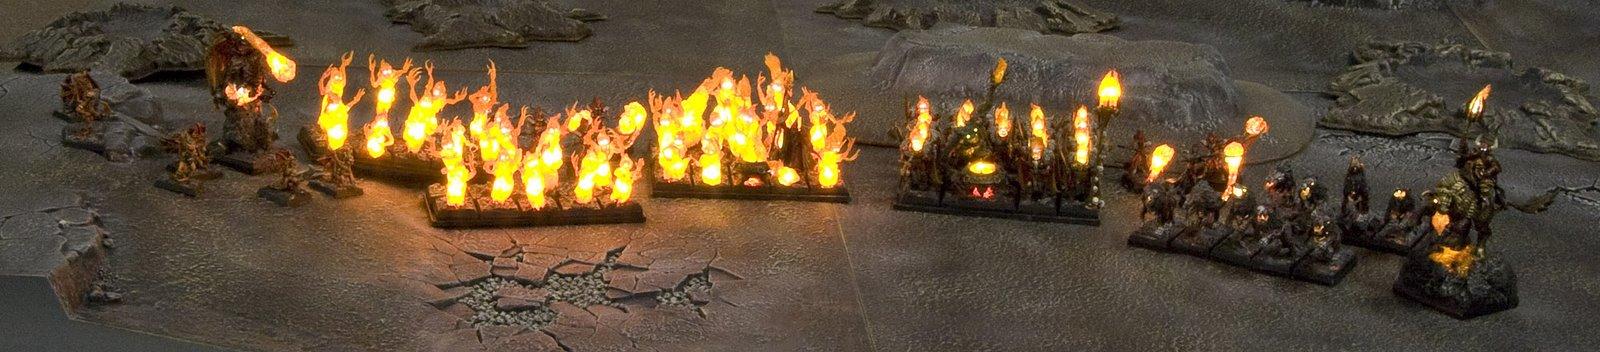 miniaturas cheveremente pintadas 3 Fantasy-flames-001